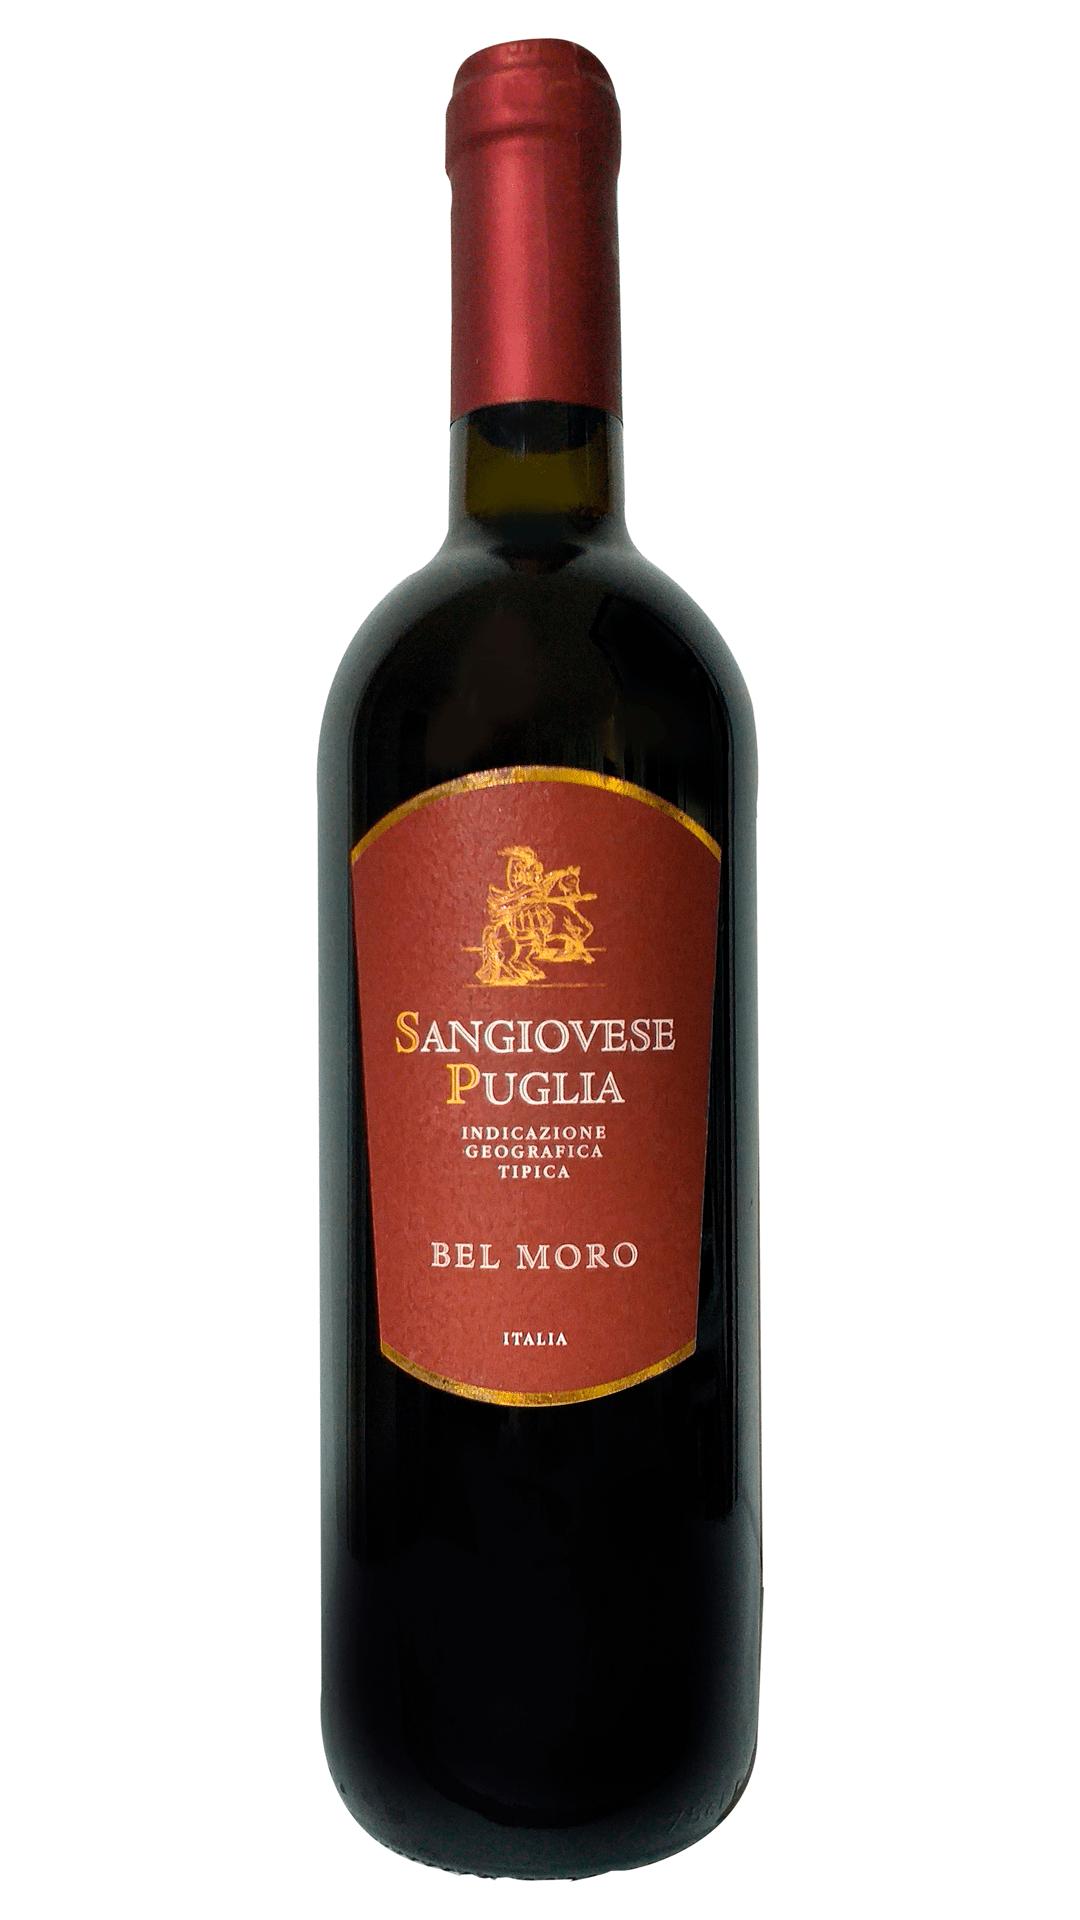 Sangiovese-Puglia-I.G.T.-Bel-Moro